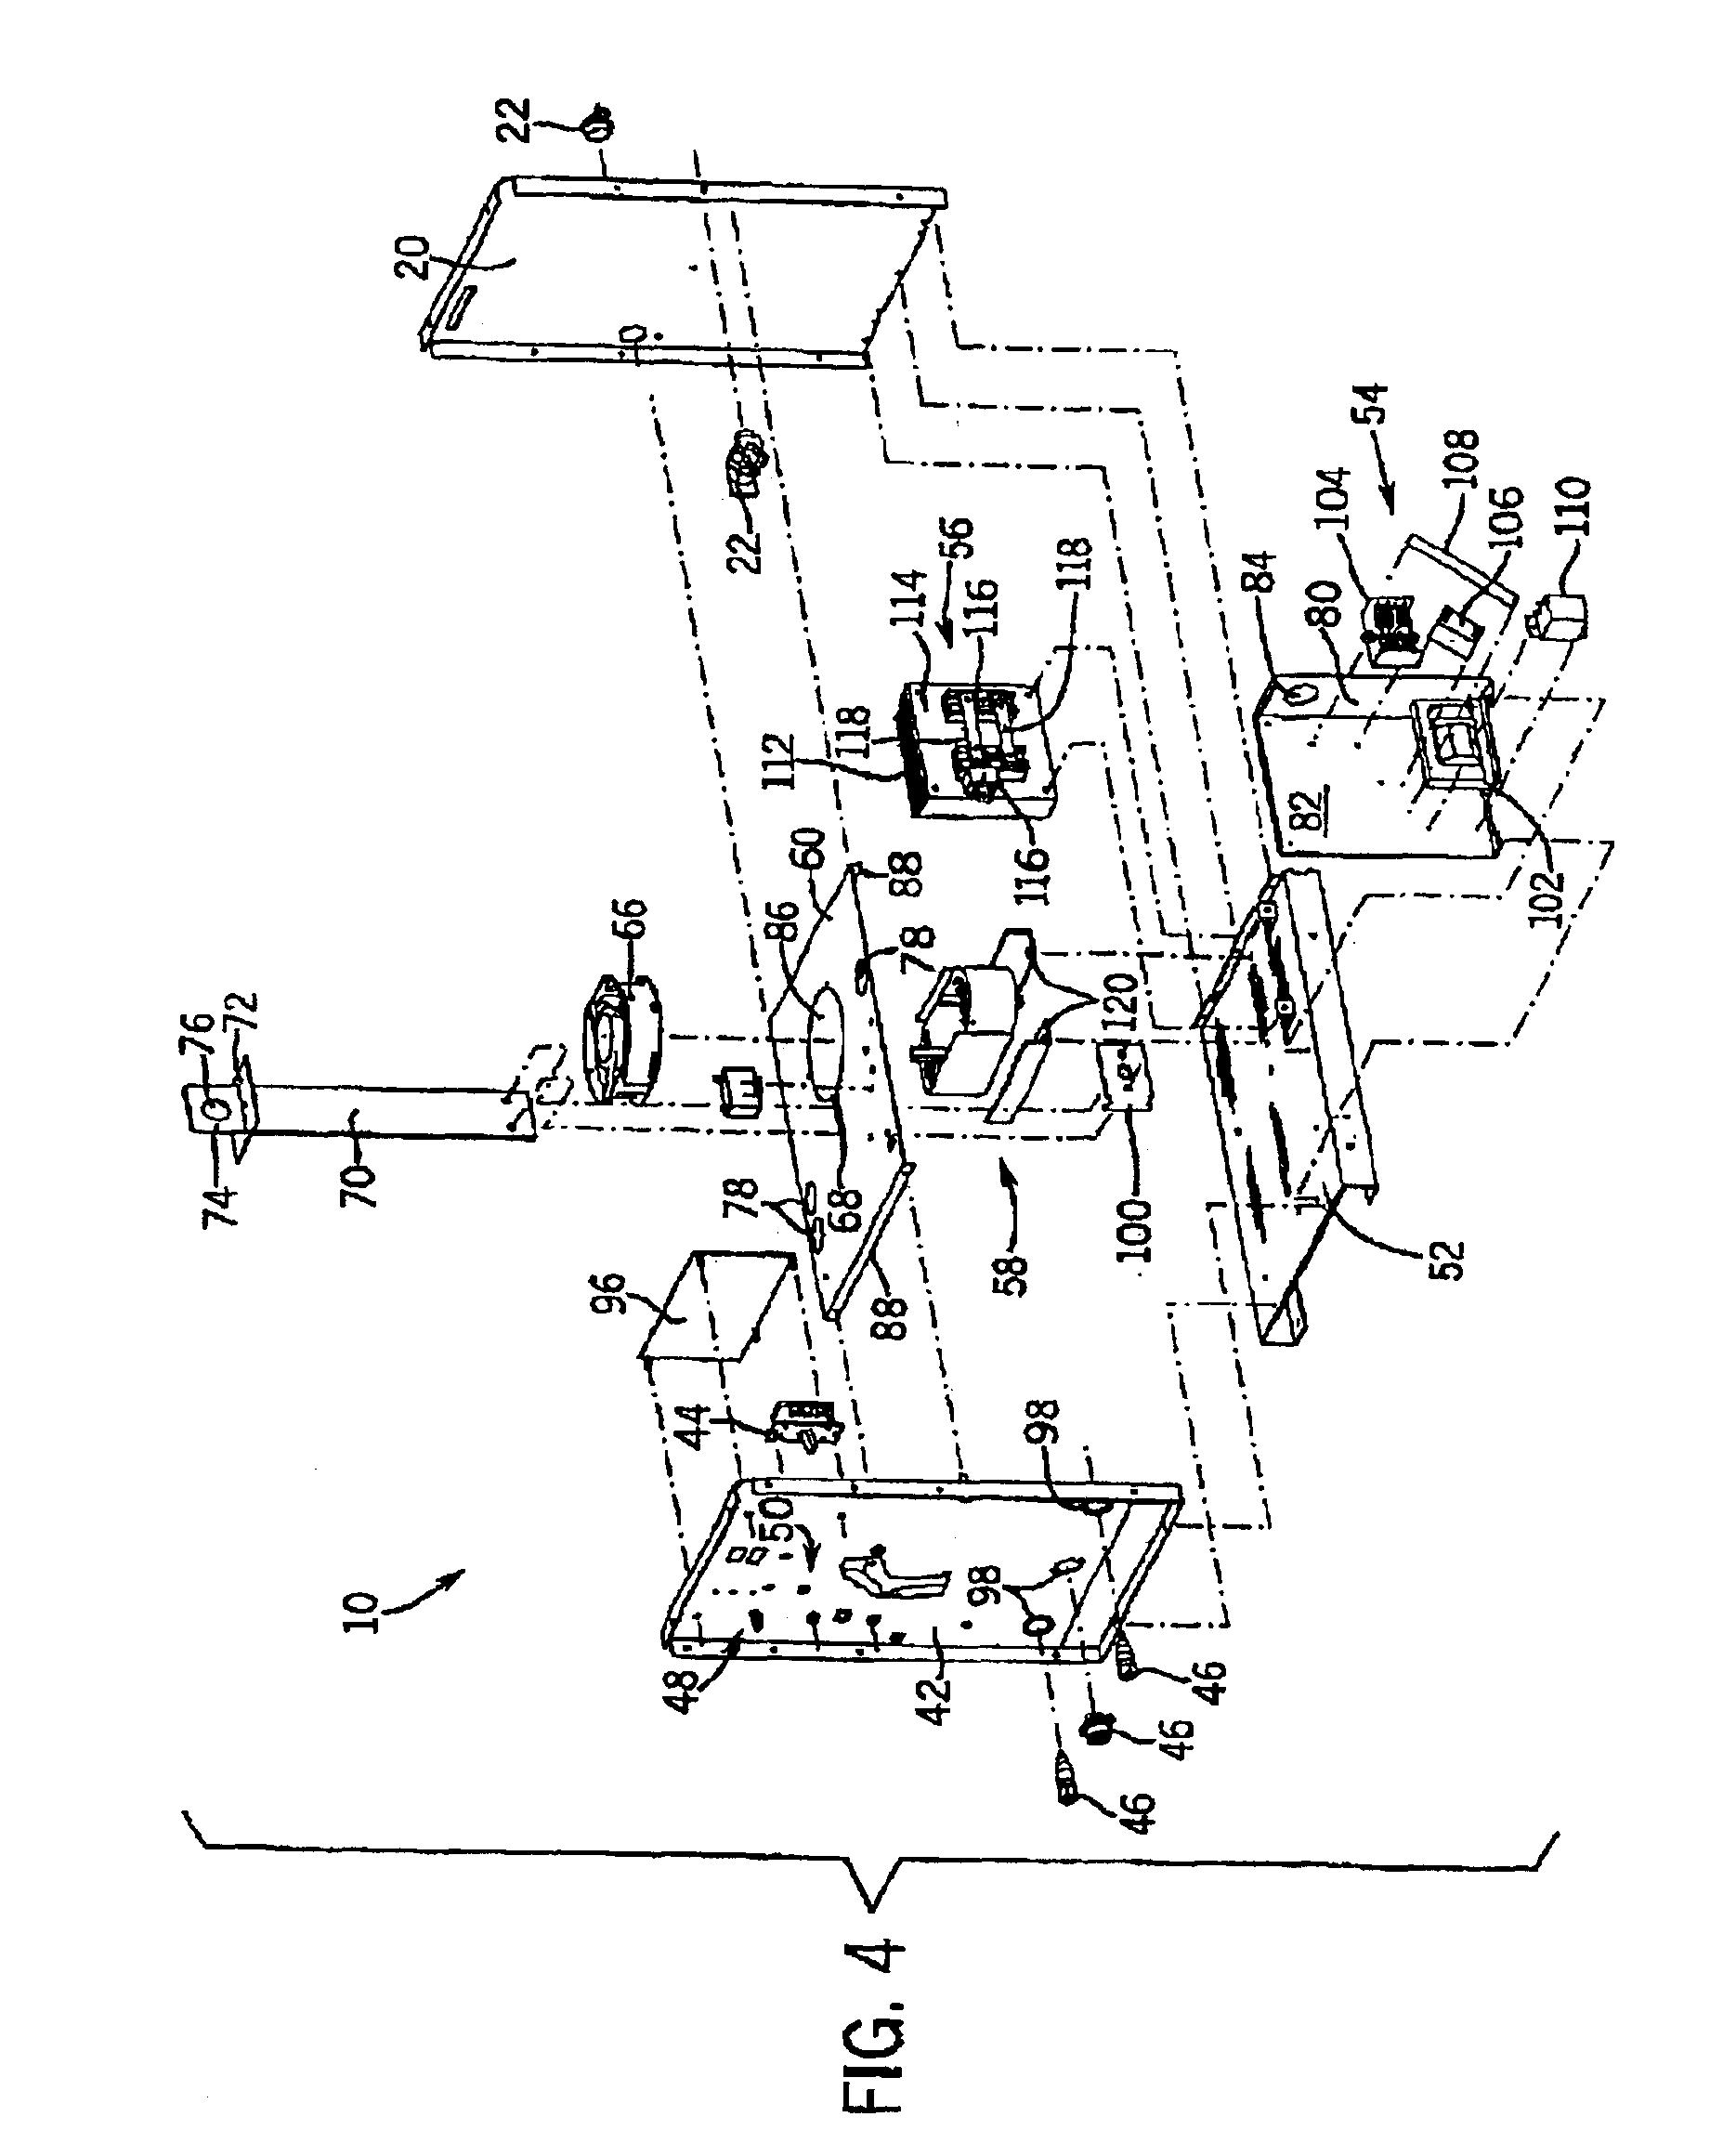 Dual sd radiator fan wiring diagram sh3 me sd fan relay wiring on switch